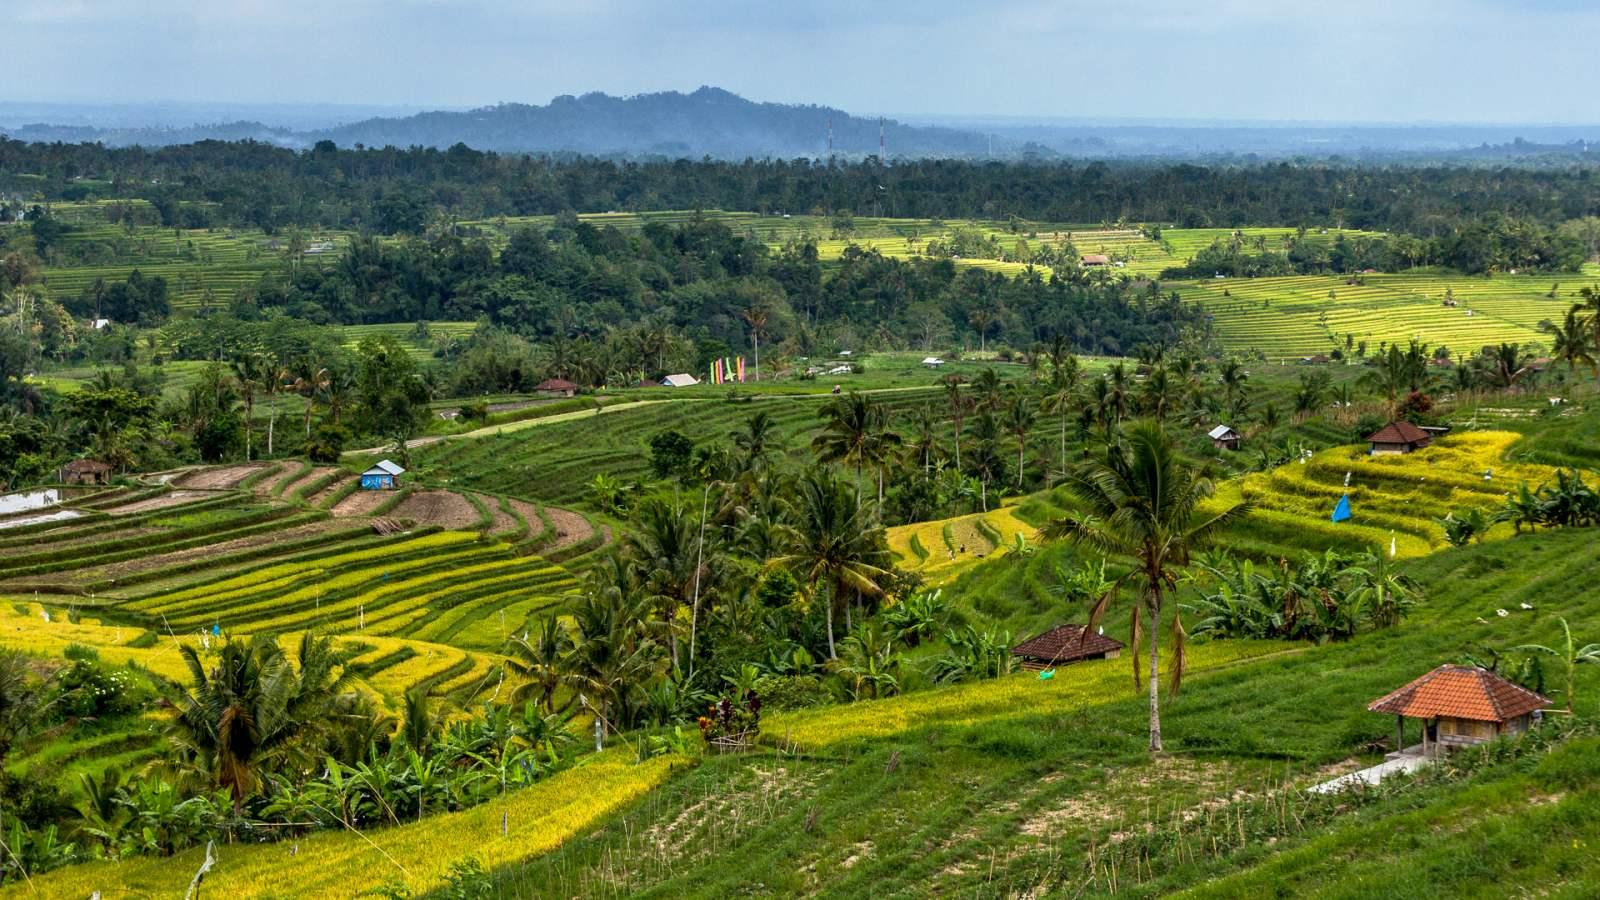 Indonésie 4 - Liduprázdný chrám Luhur Batukaru a rýžové terasy Jatiluwih